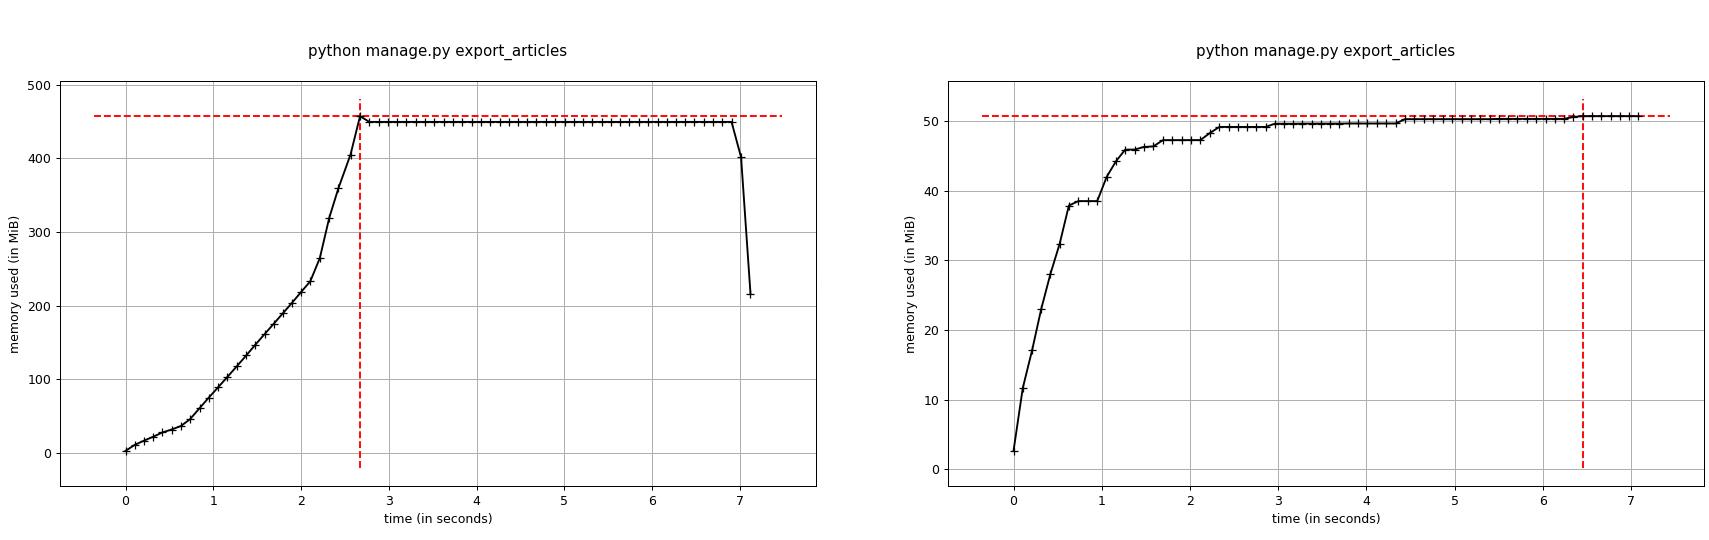 Django project optimization guide (part 2)